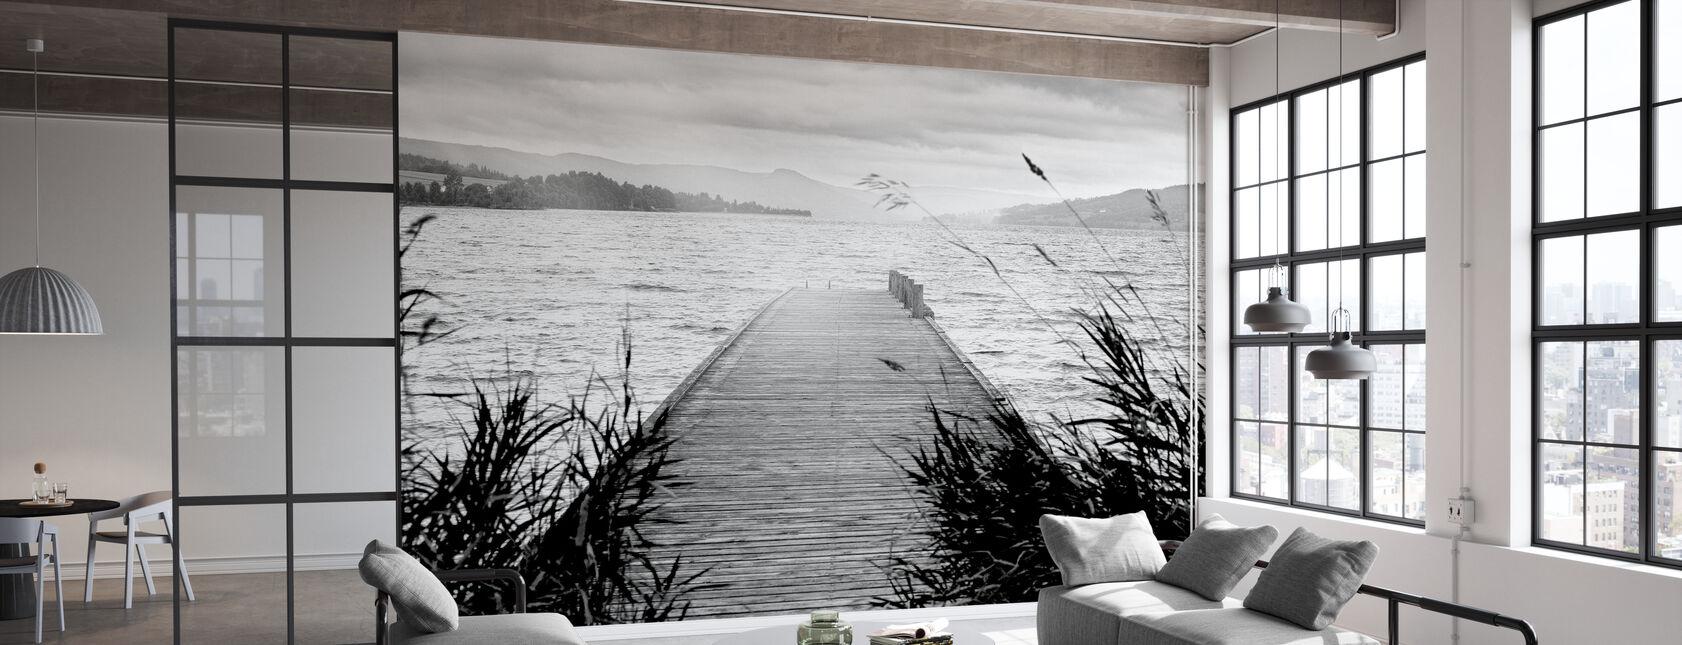 Pier on Hadeland - Wallpaper - Office